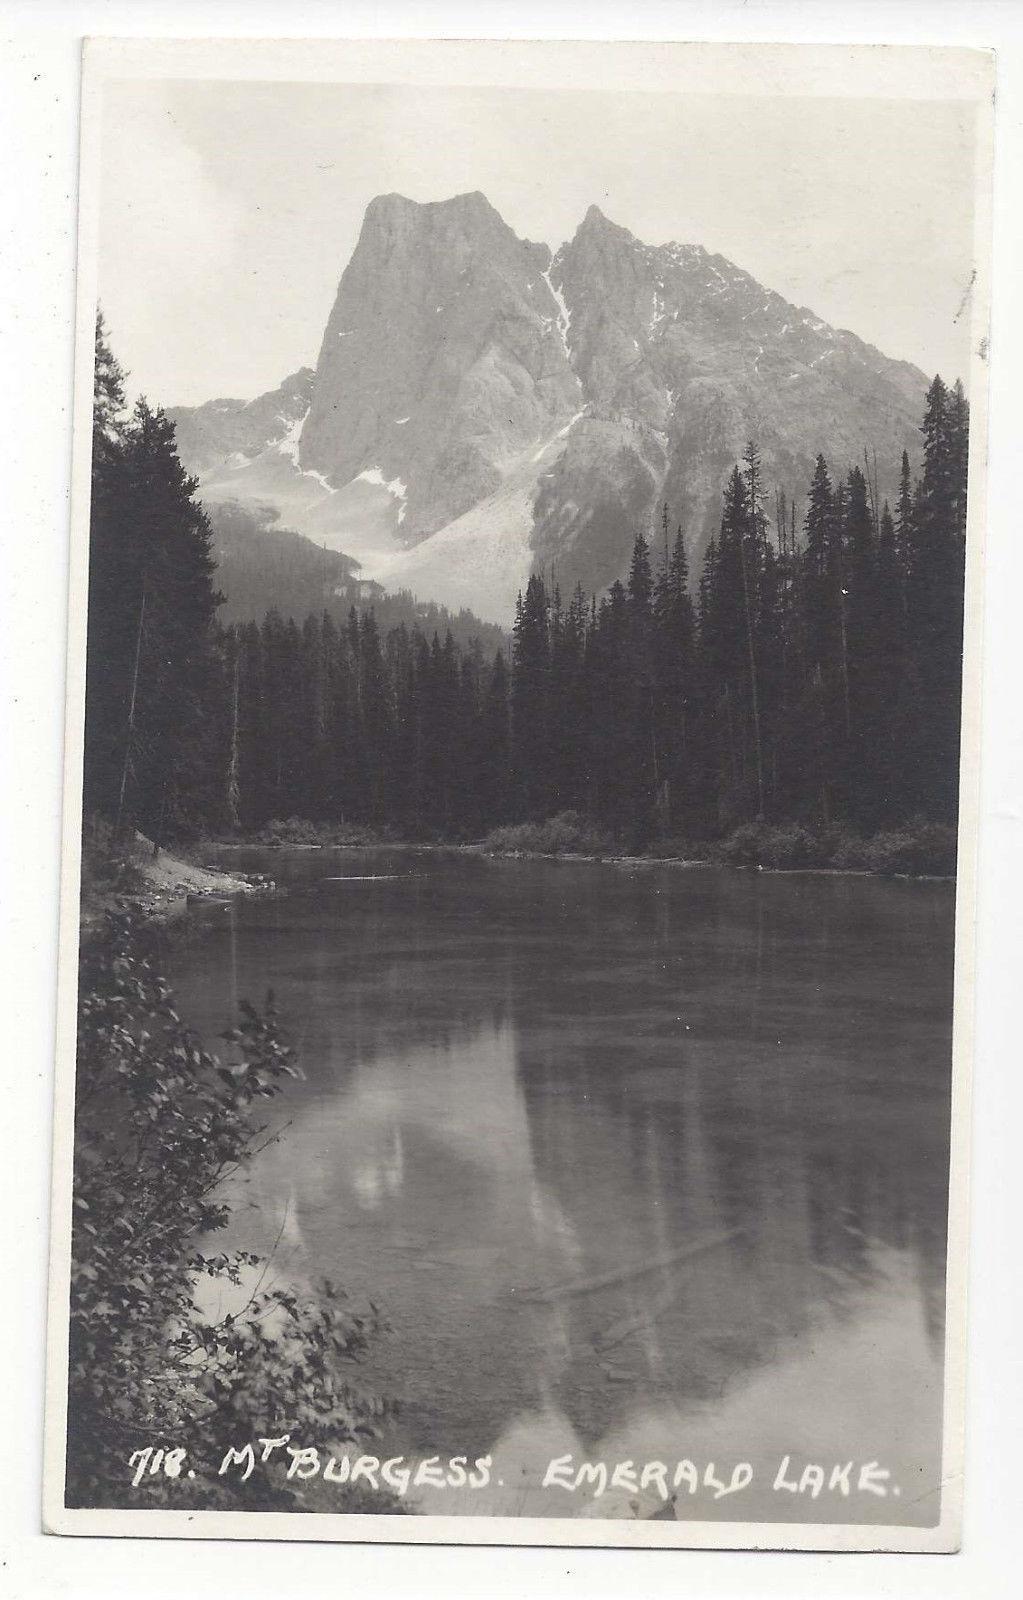 Canada RPPC Emerald Lake Mt Murgess Rockies Vtg Real Photo Postcard 1941